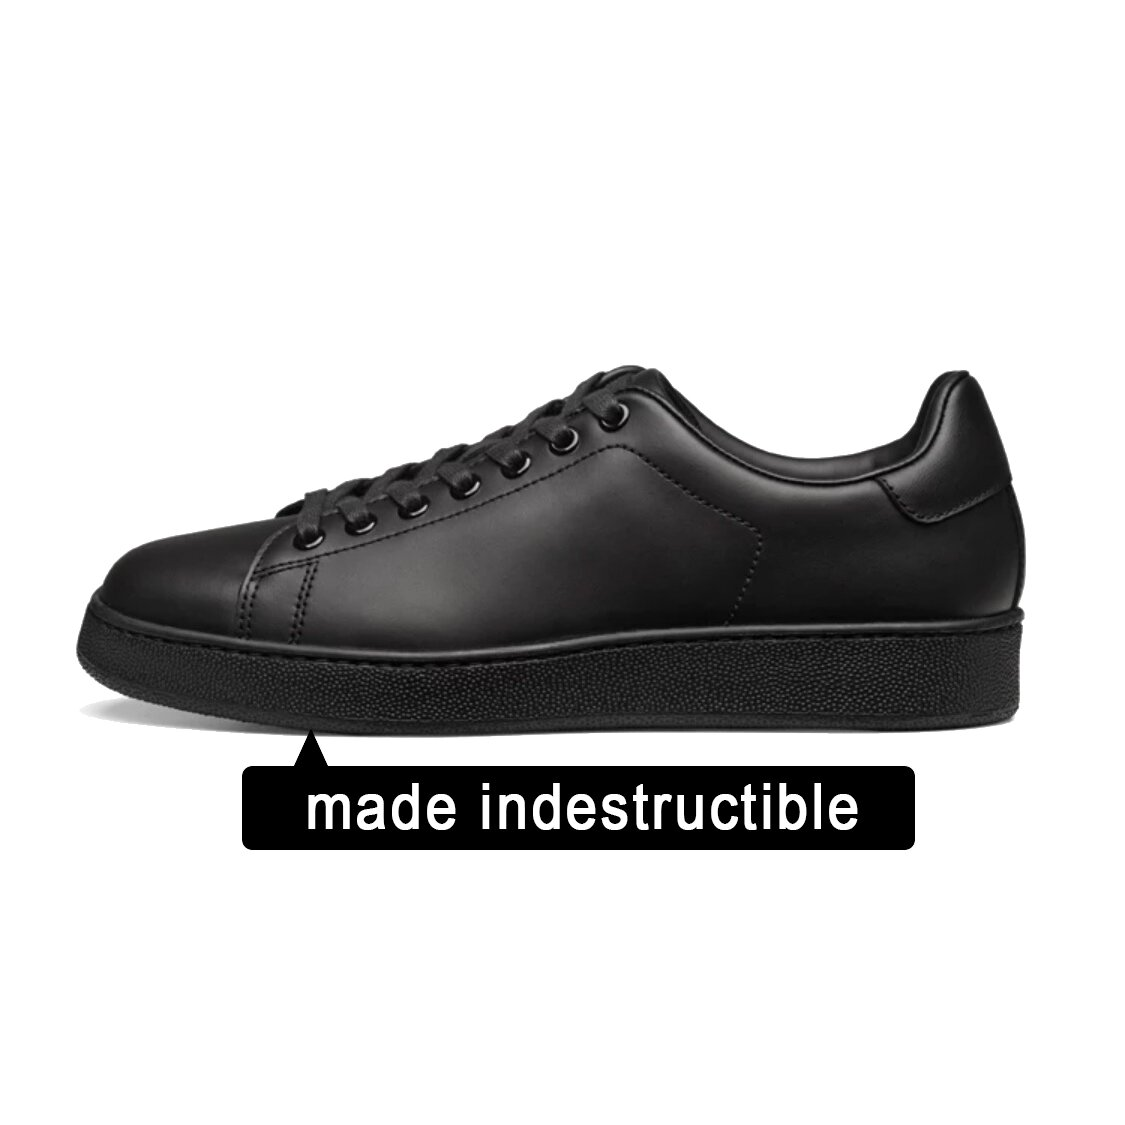 graphene-footwear-shoes